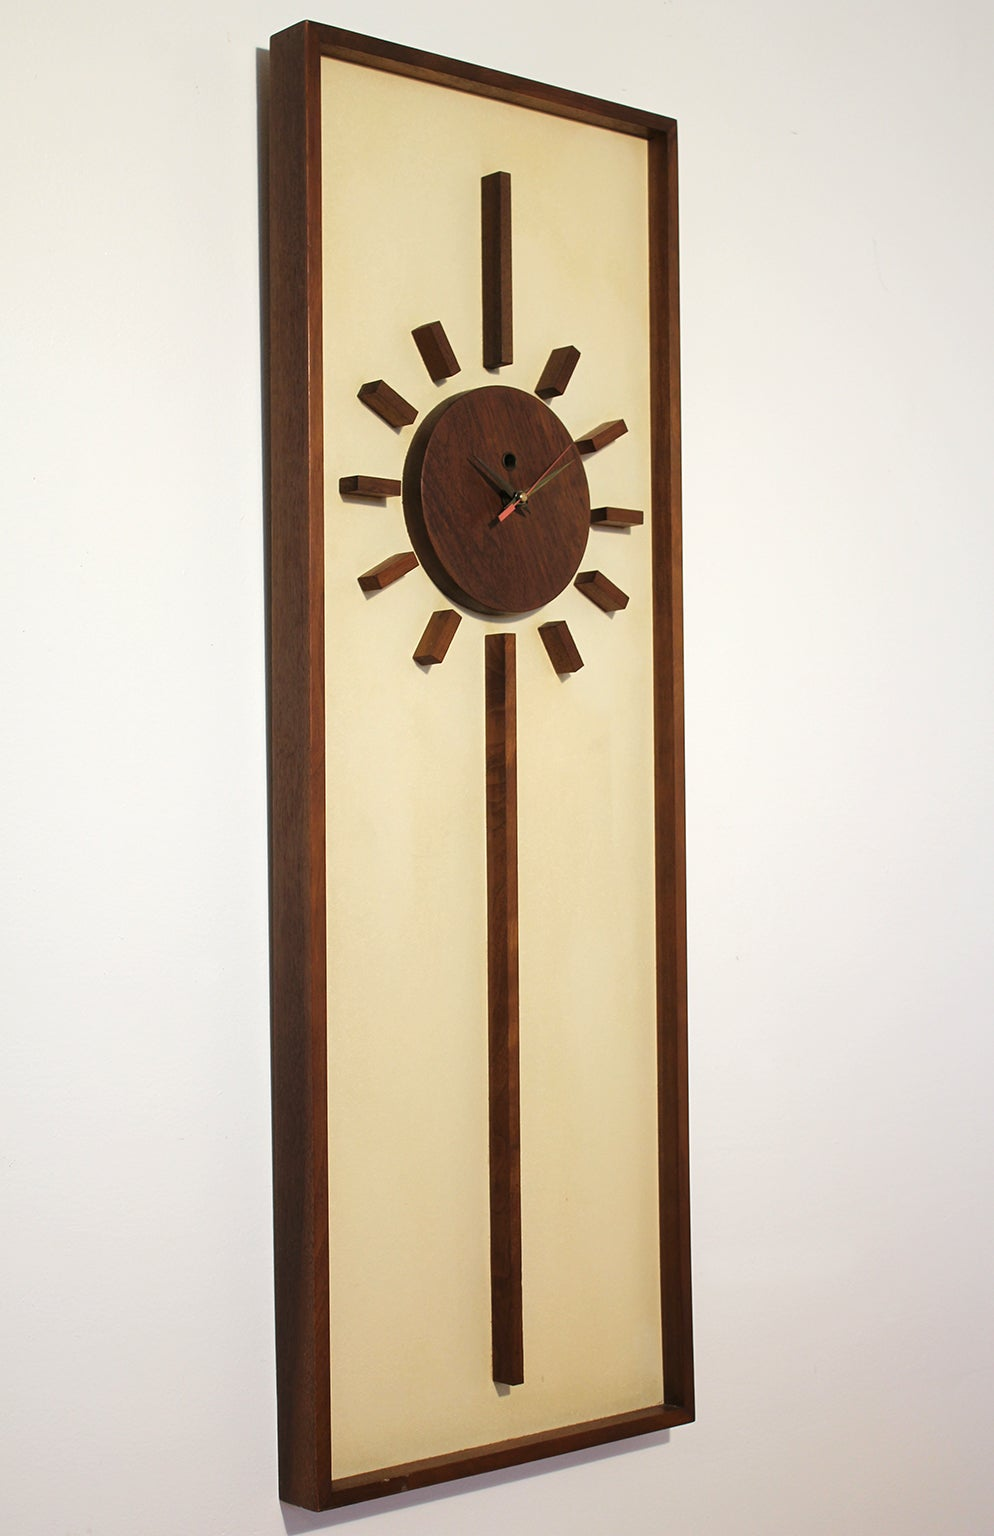 Vintage Modern Peter Pepper Wall Clock at 1stdibs